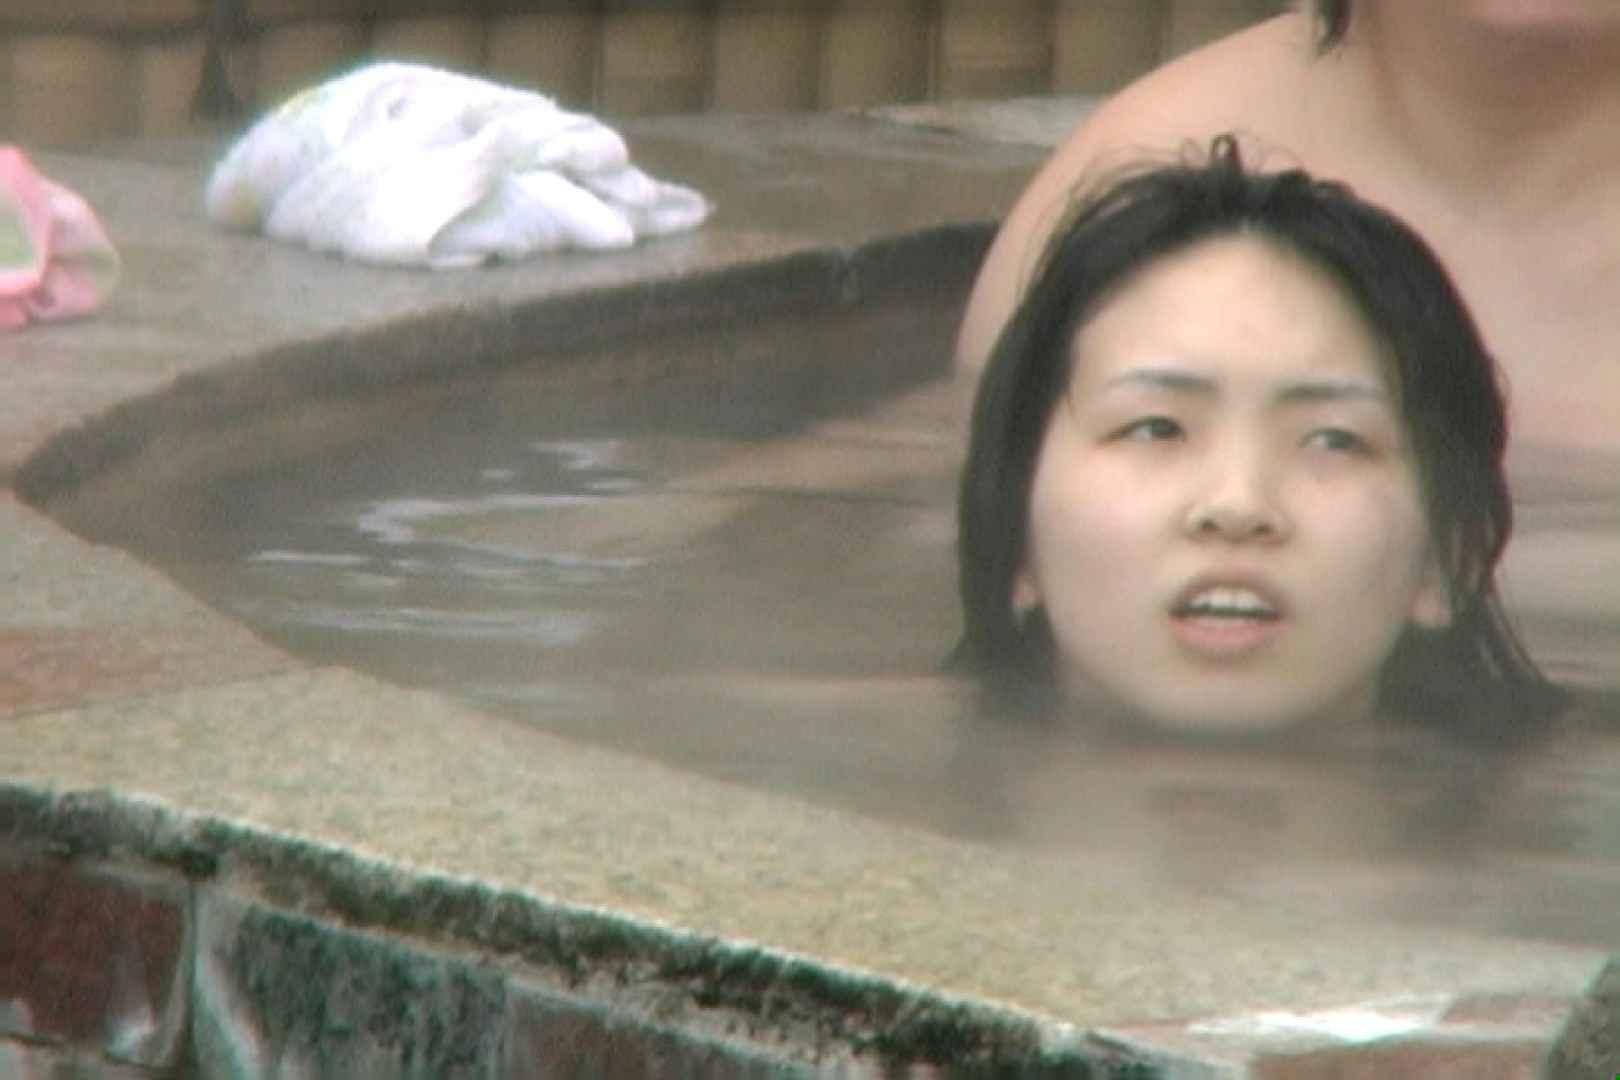 Aquaな露天風呂Vol.646 HなOL | 盗撮  89pic 65